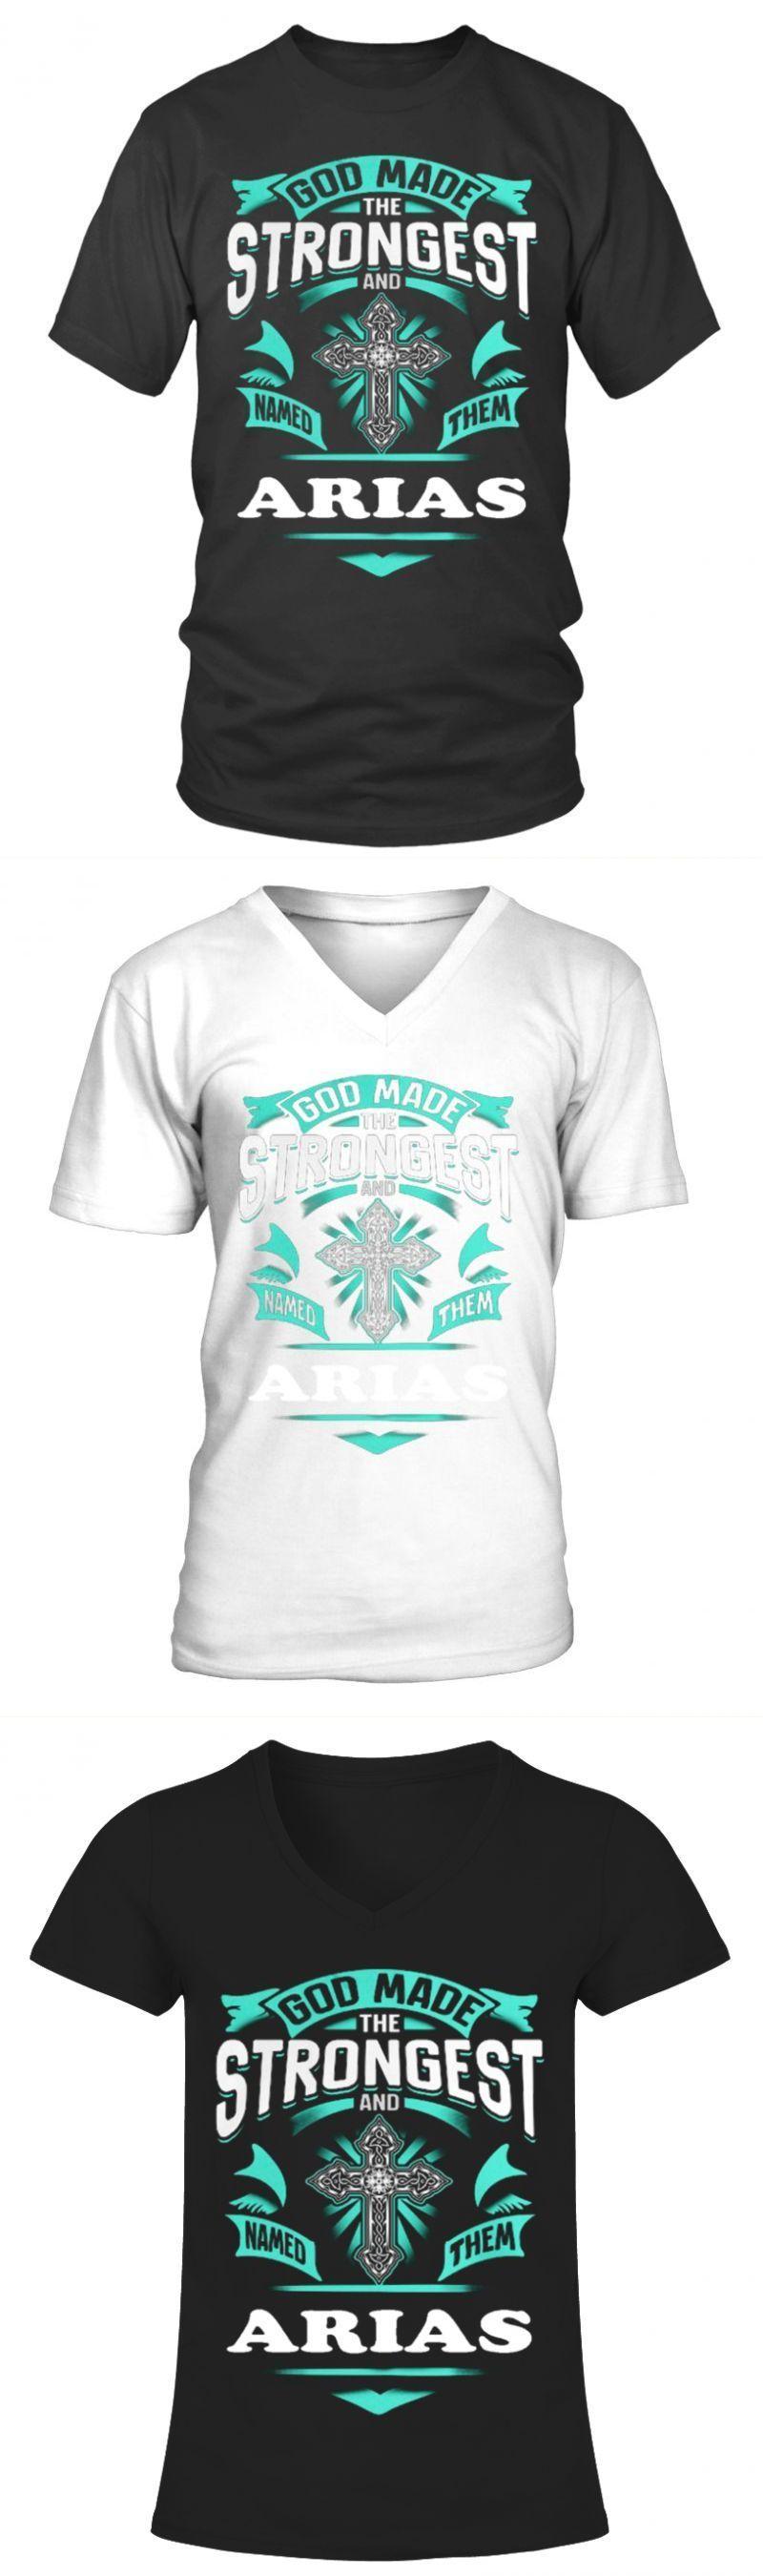 b4a8e4199 Ari t-shirt for woman arias element ari t-shirt #ari #t-shirt #for #woman # arias #element #round #neck #unisex #v-neck